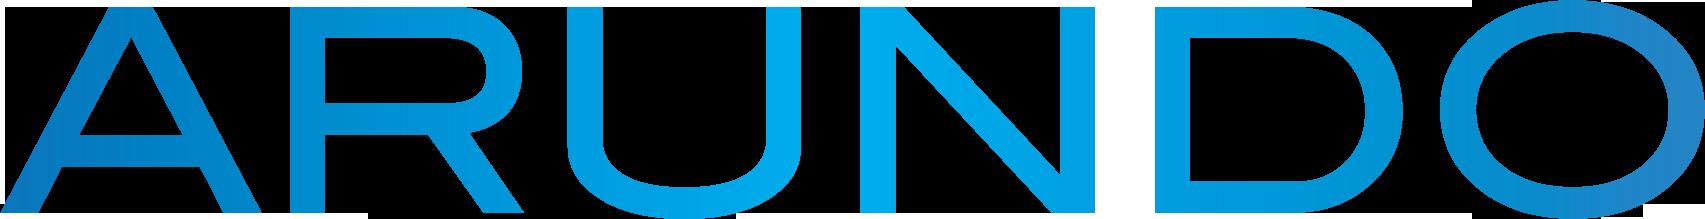 Image result for arundo logo